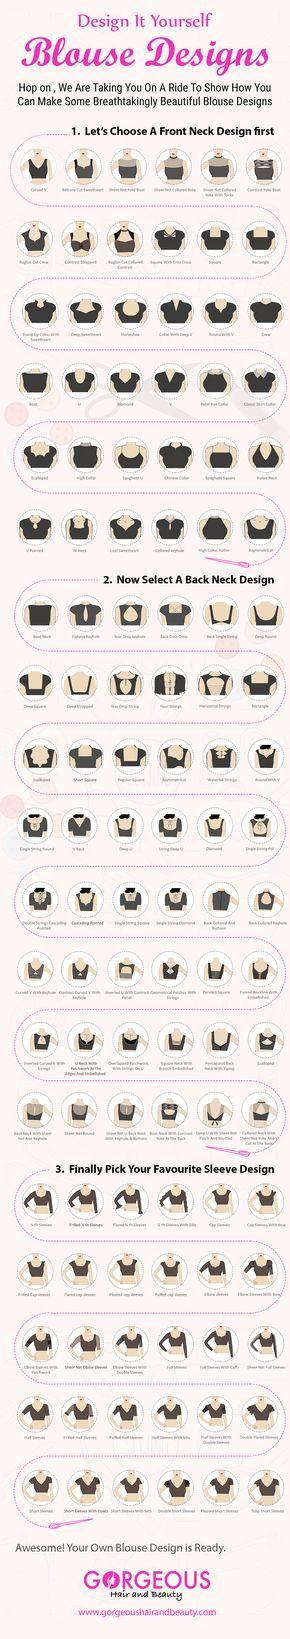 30 Fashionable Front Neck Blouse Designs 35 Stylish Back Neck Blouse Designs 25 Exquisite Boat Neck Blouse Designs. jwt